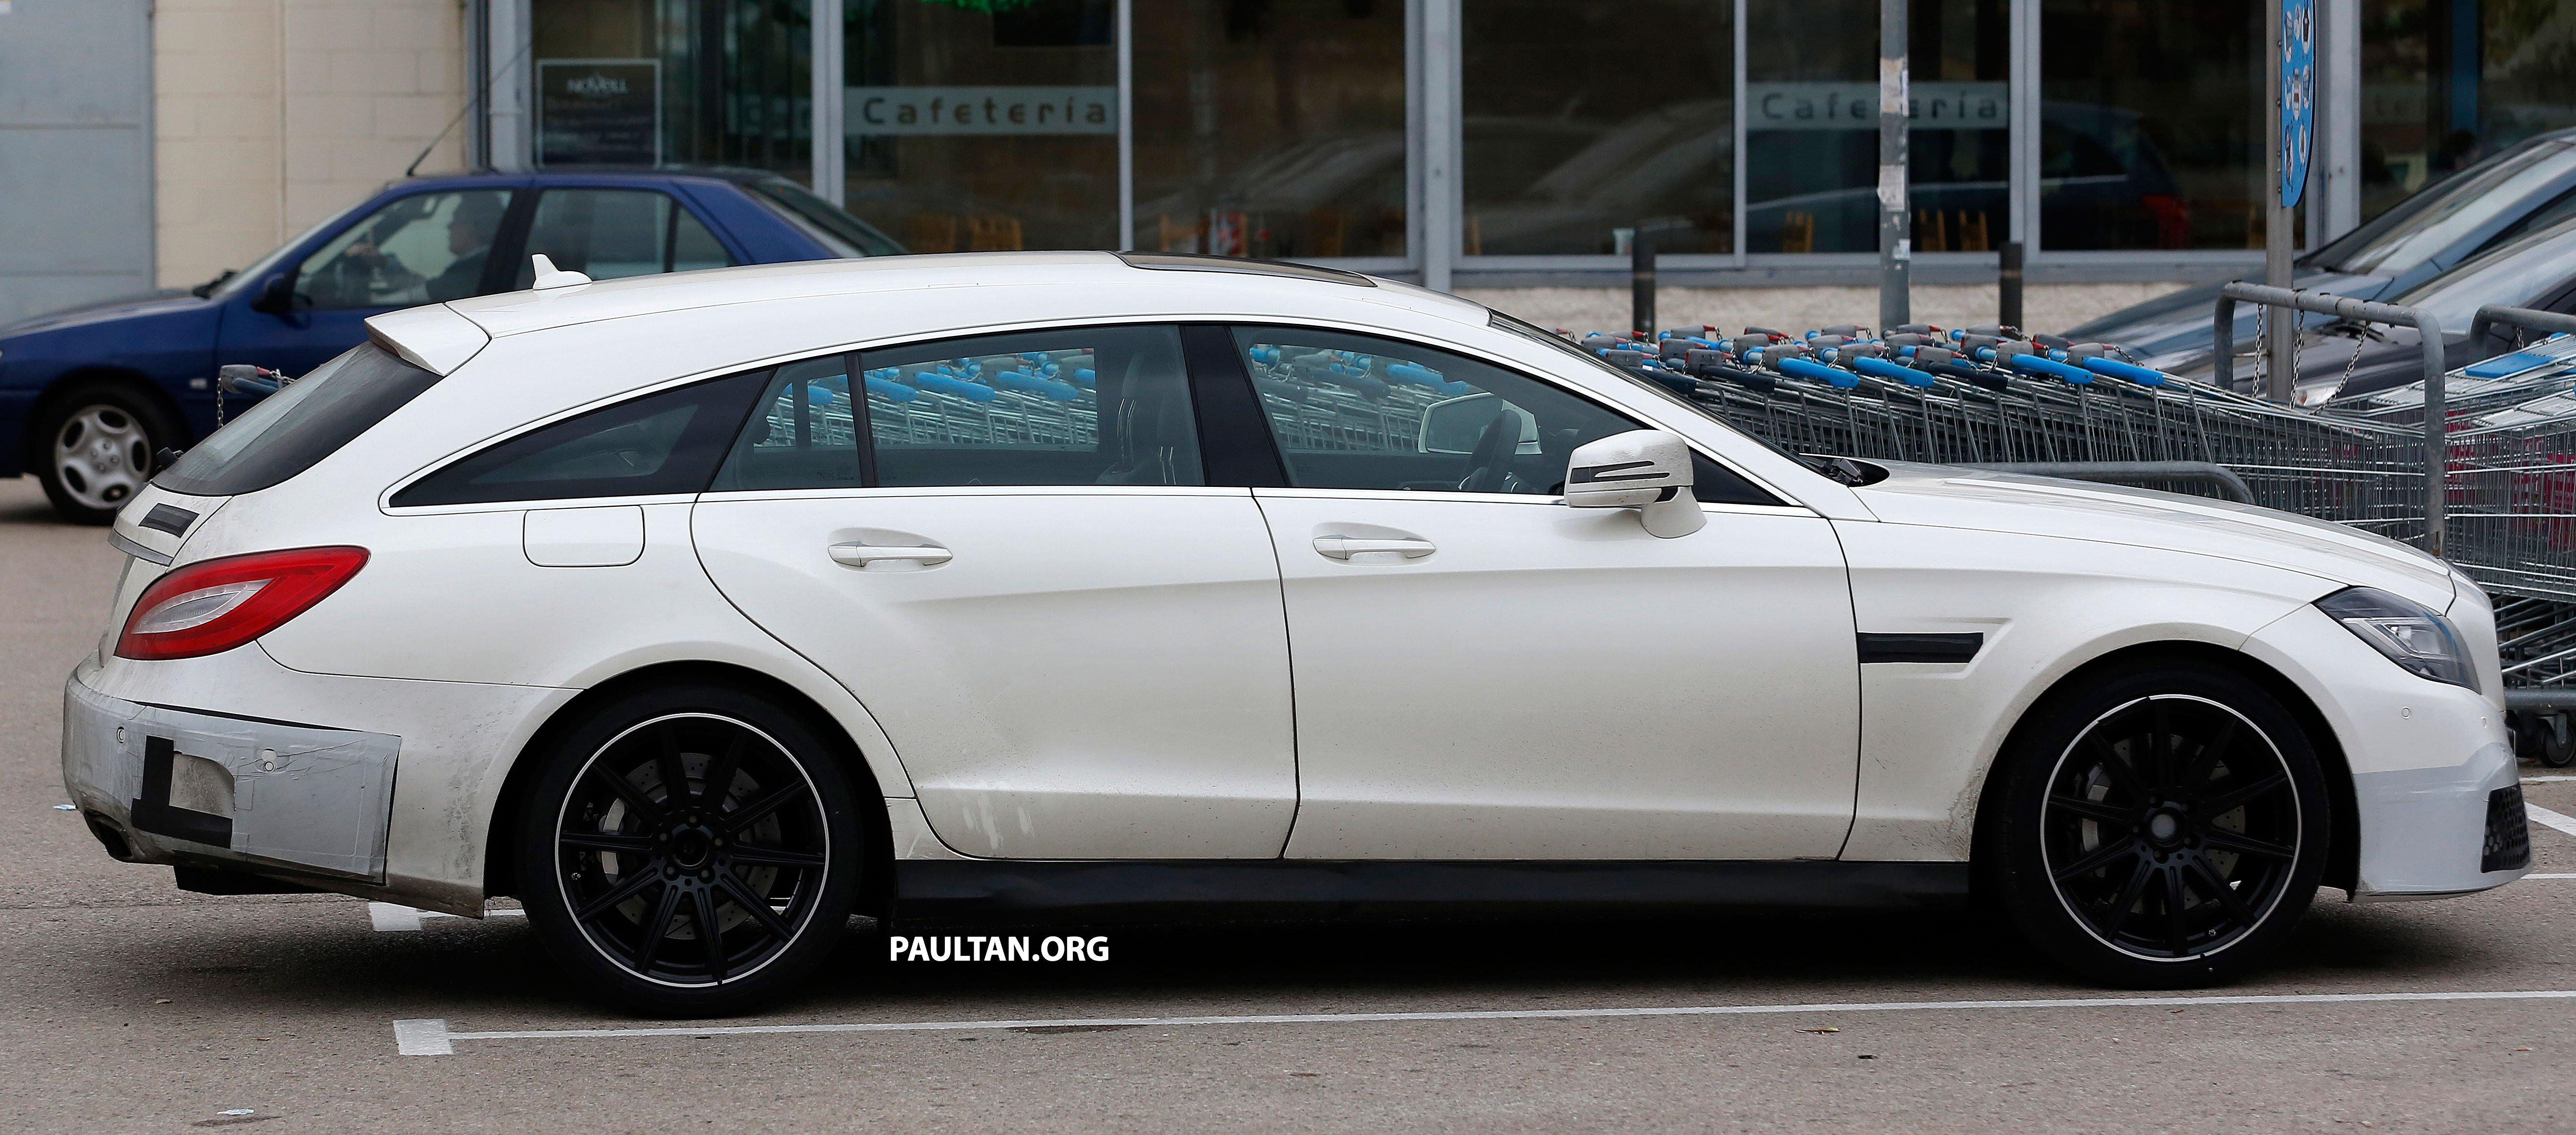 Mercedes Benz Cls Class Shooting Brake Facelift To Get